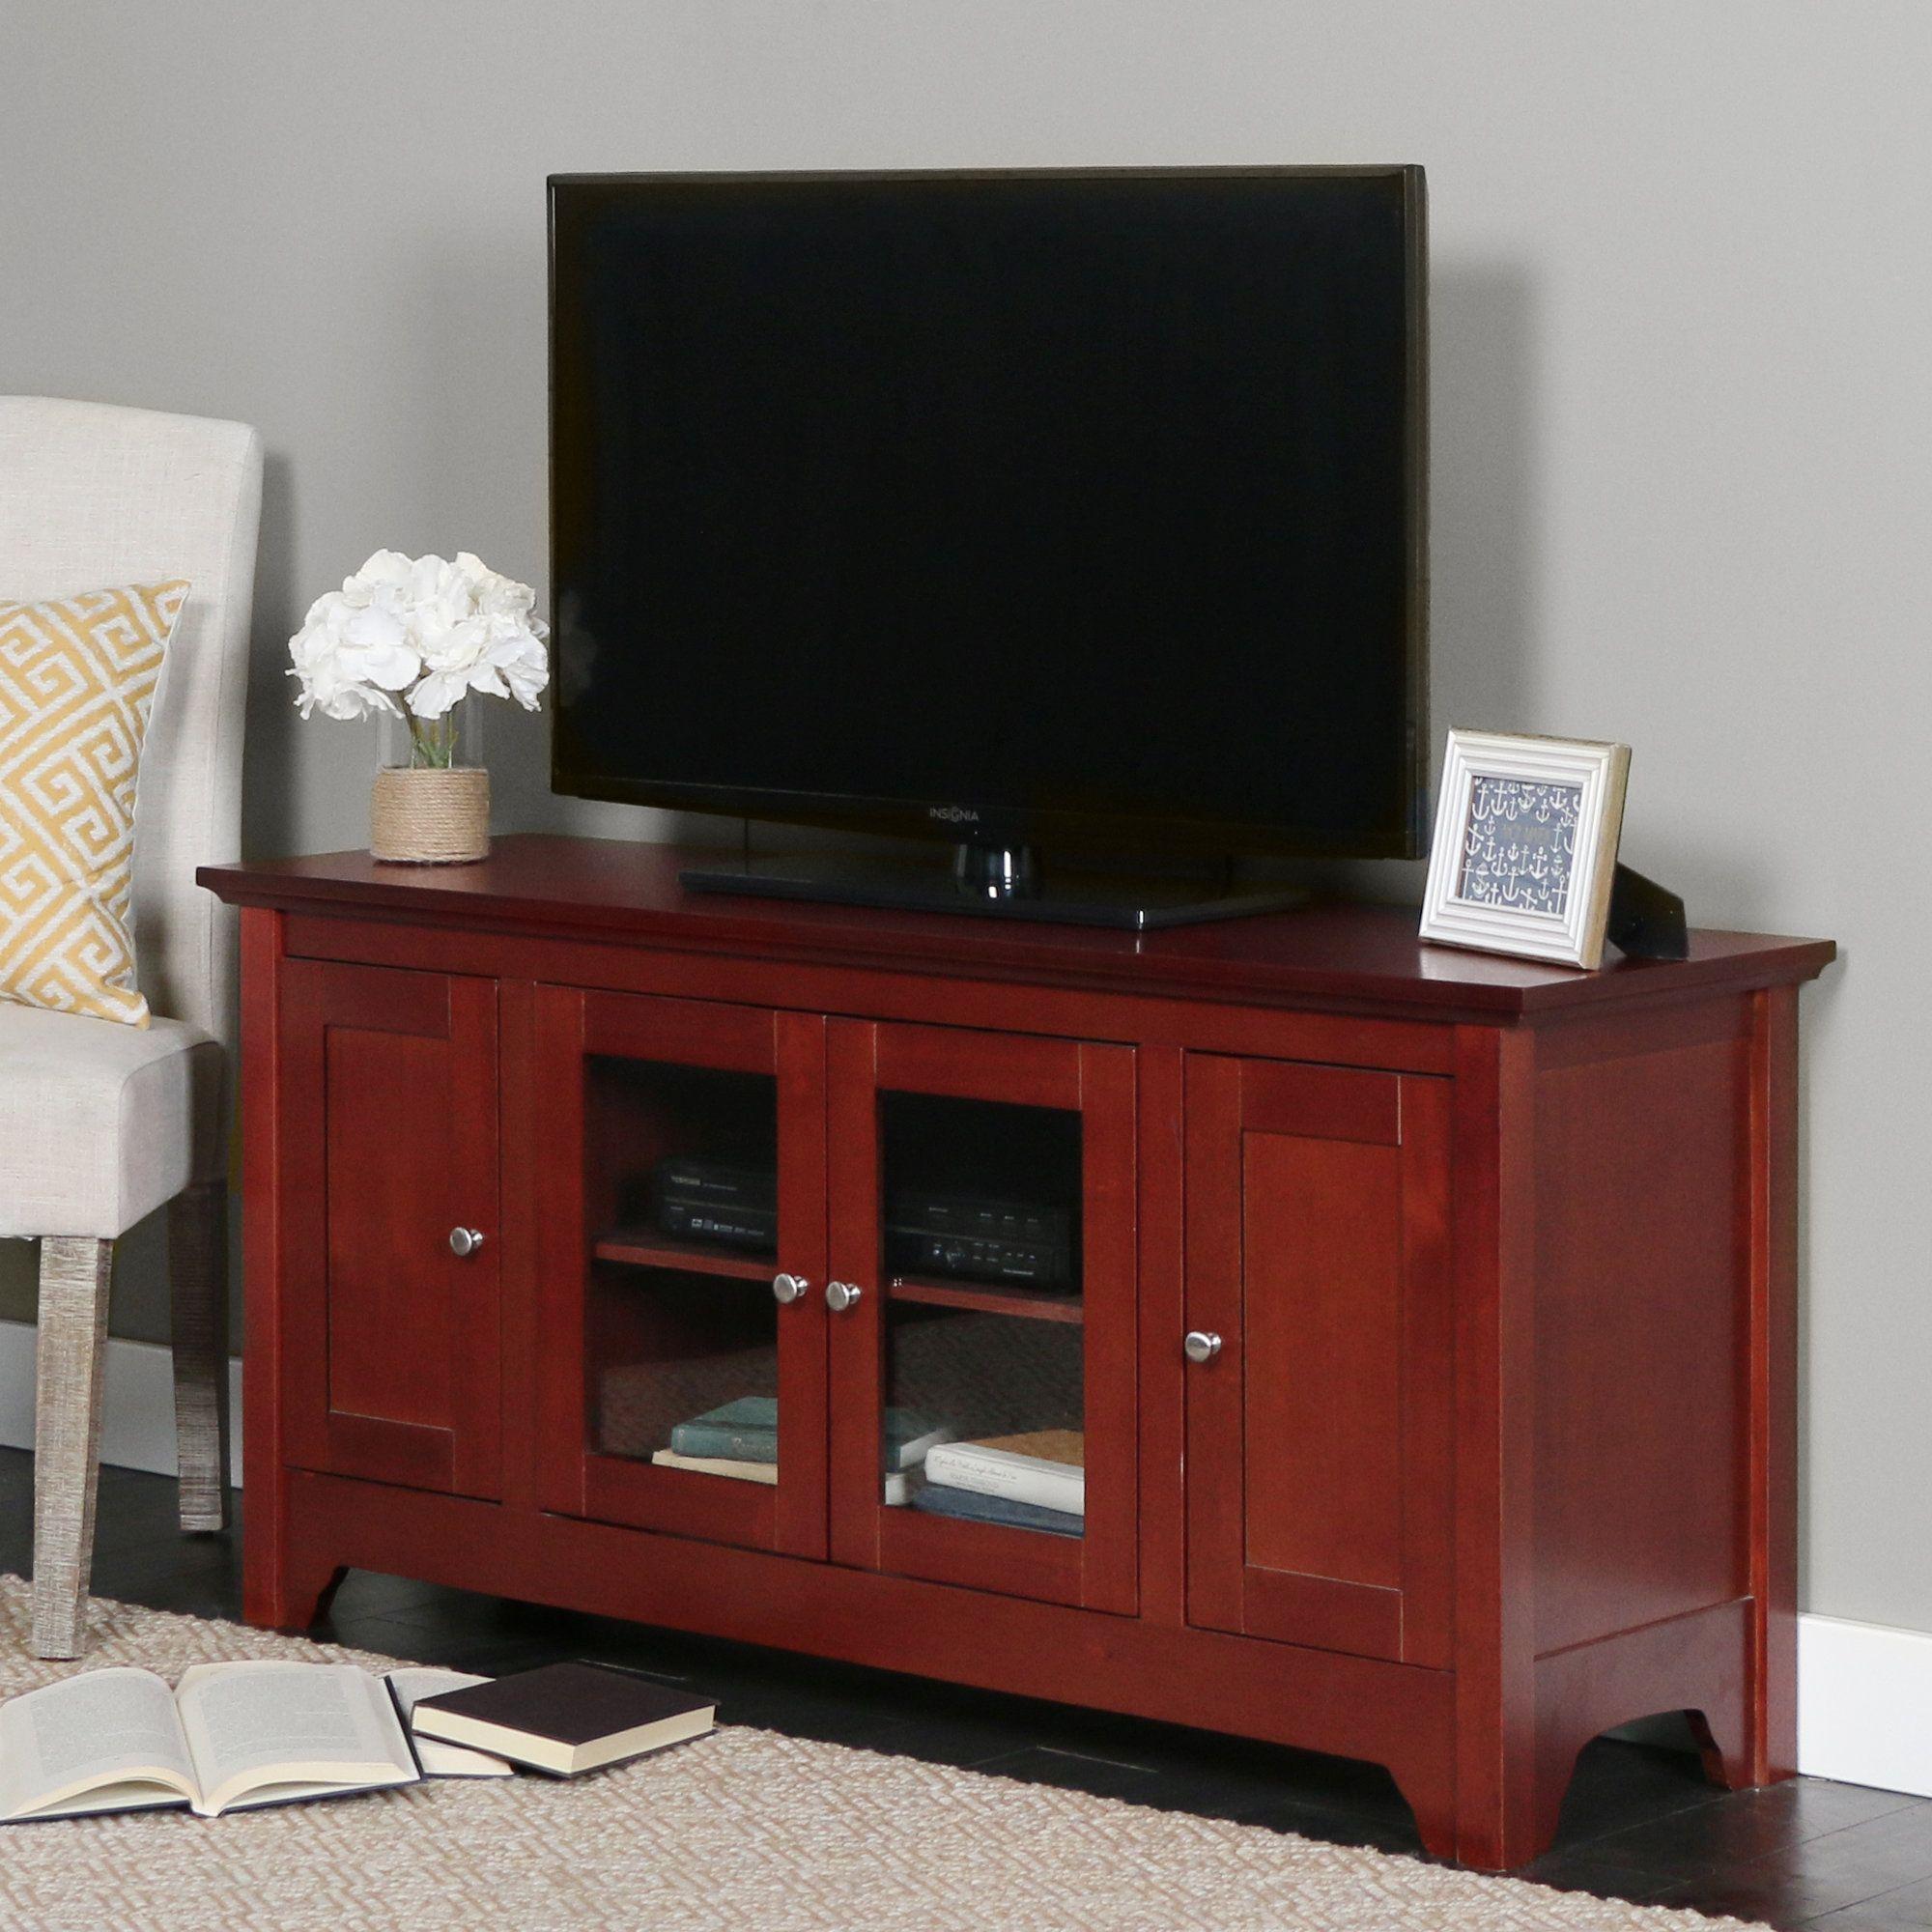 Crosley Black Alexandria 42 Tv Stand Entertainment Center Low Profile Tv Stand Crosley Furniture